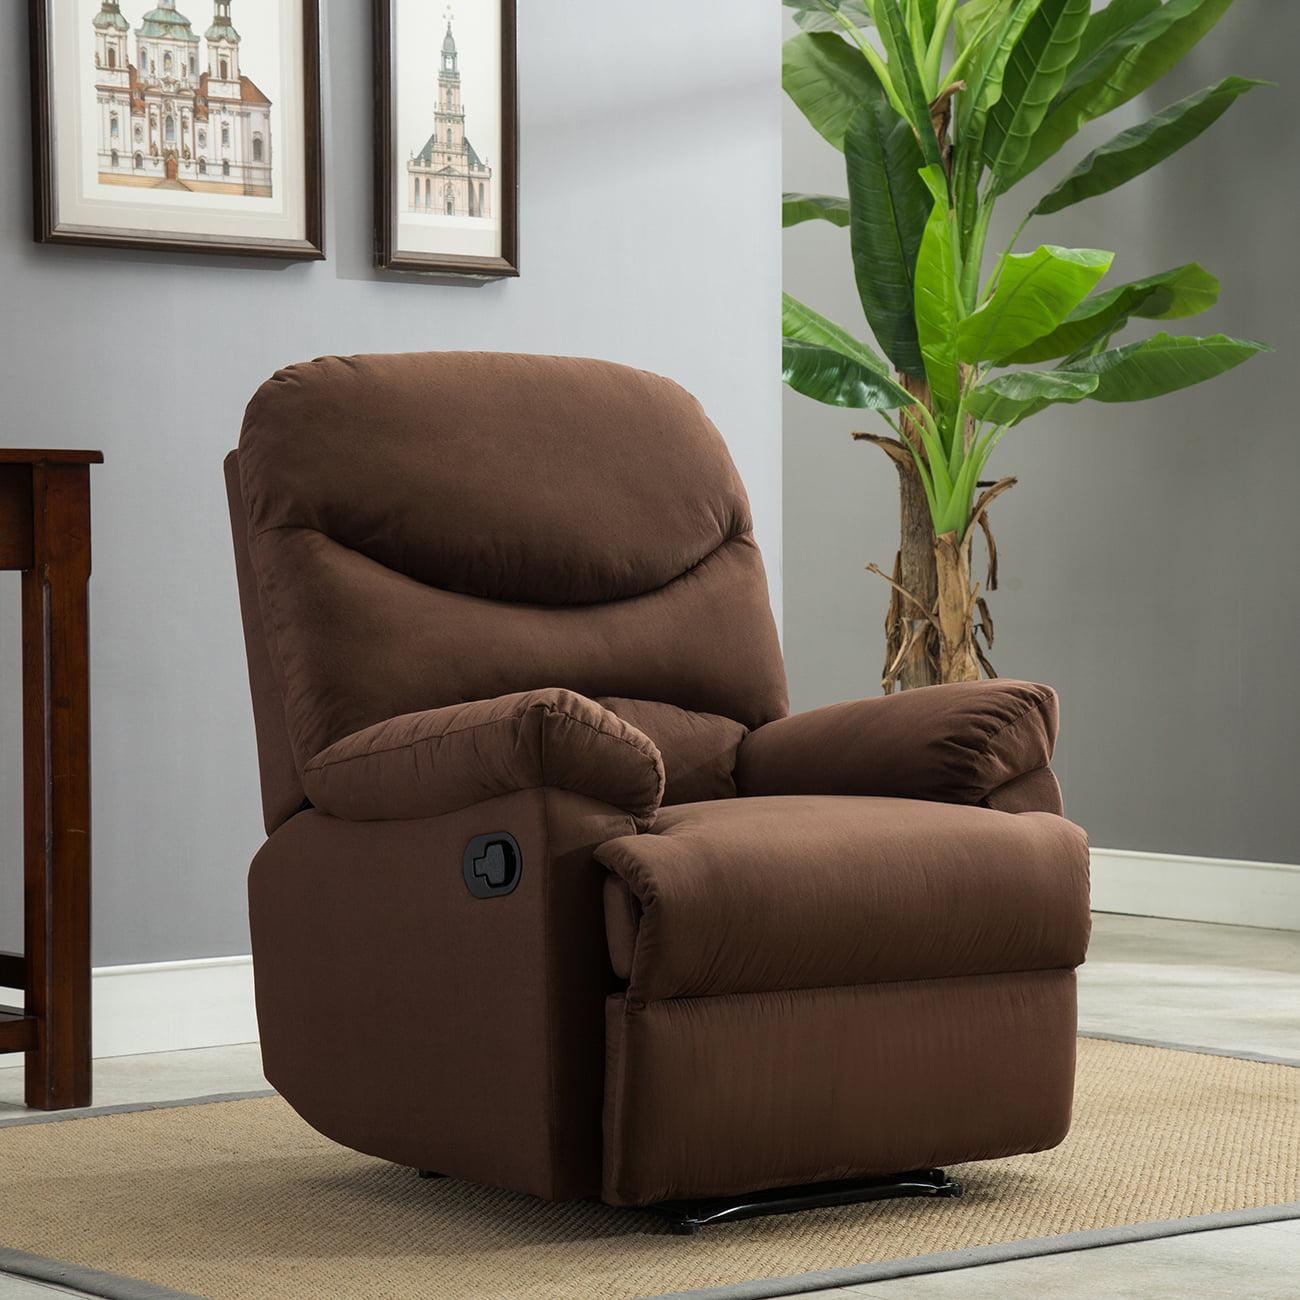 Belleze Microfiber Recliner Sofa Chair Reclining Positions Ergonomic Armrests Footrests Brown